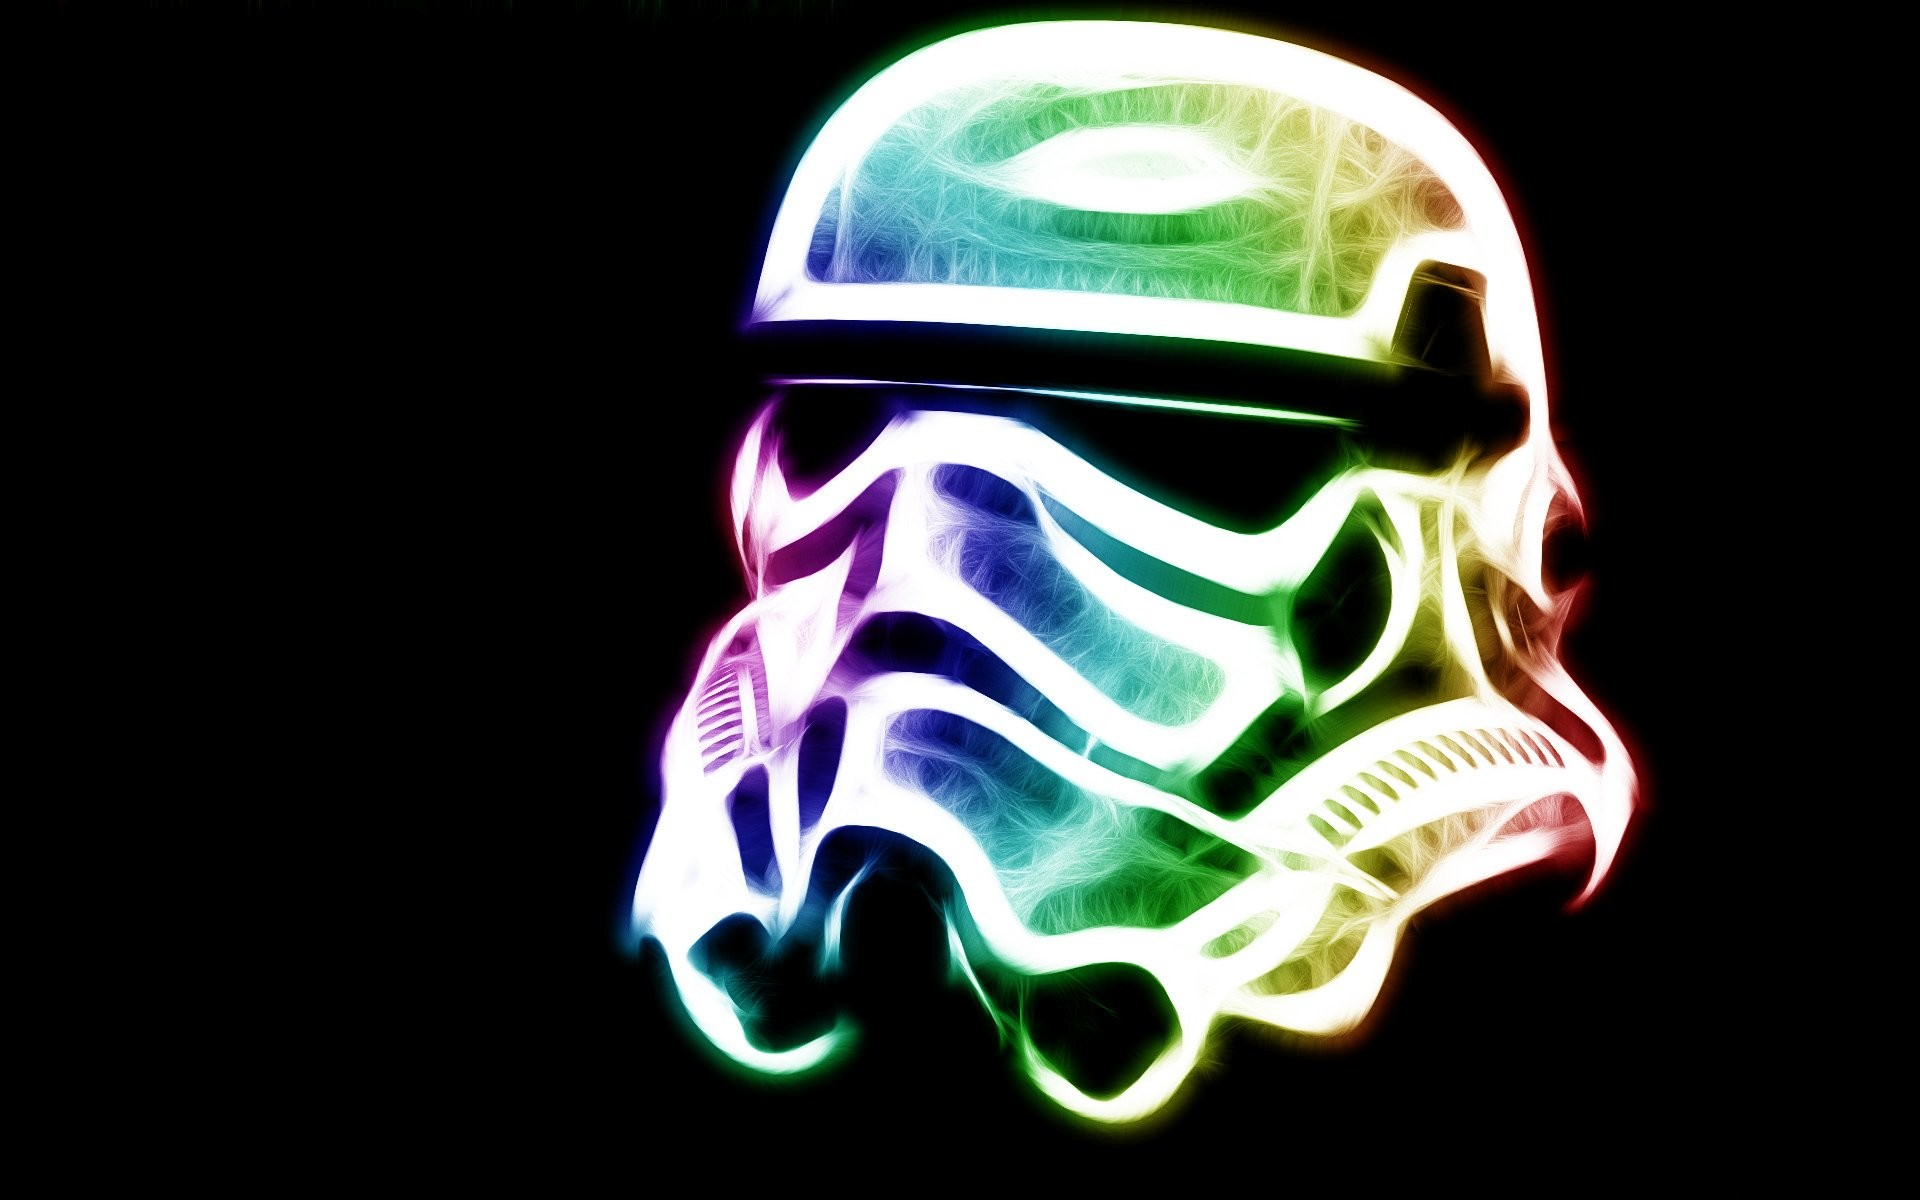 Star Wars Stormtrooper 575082